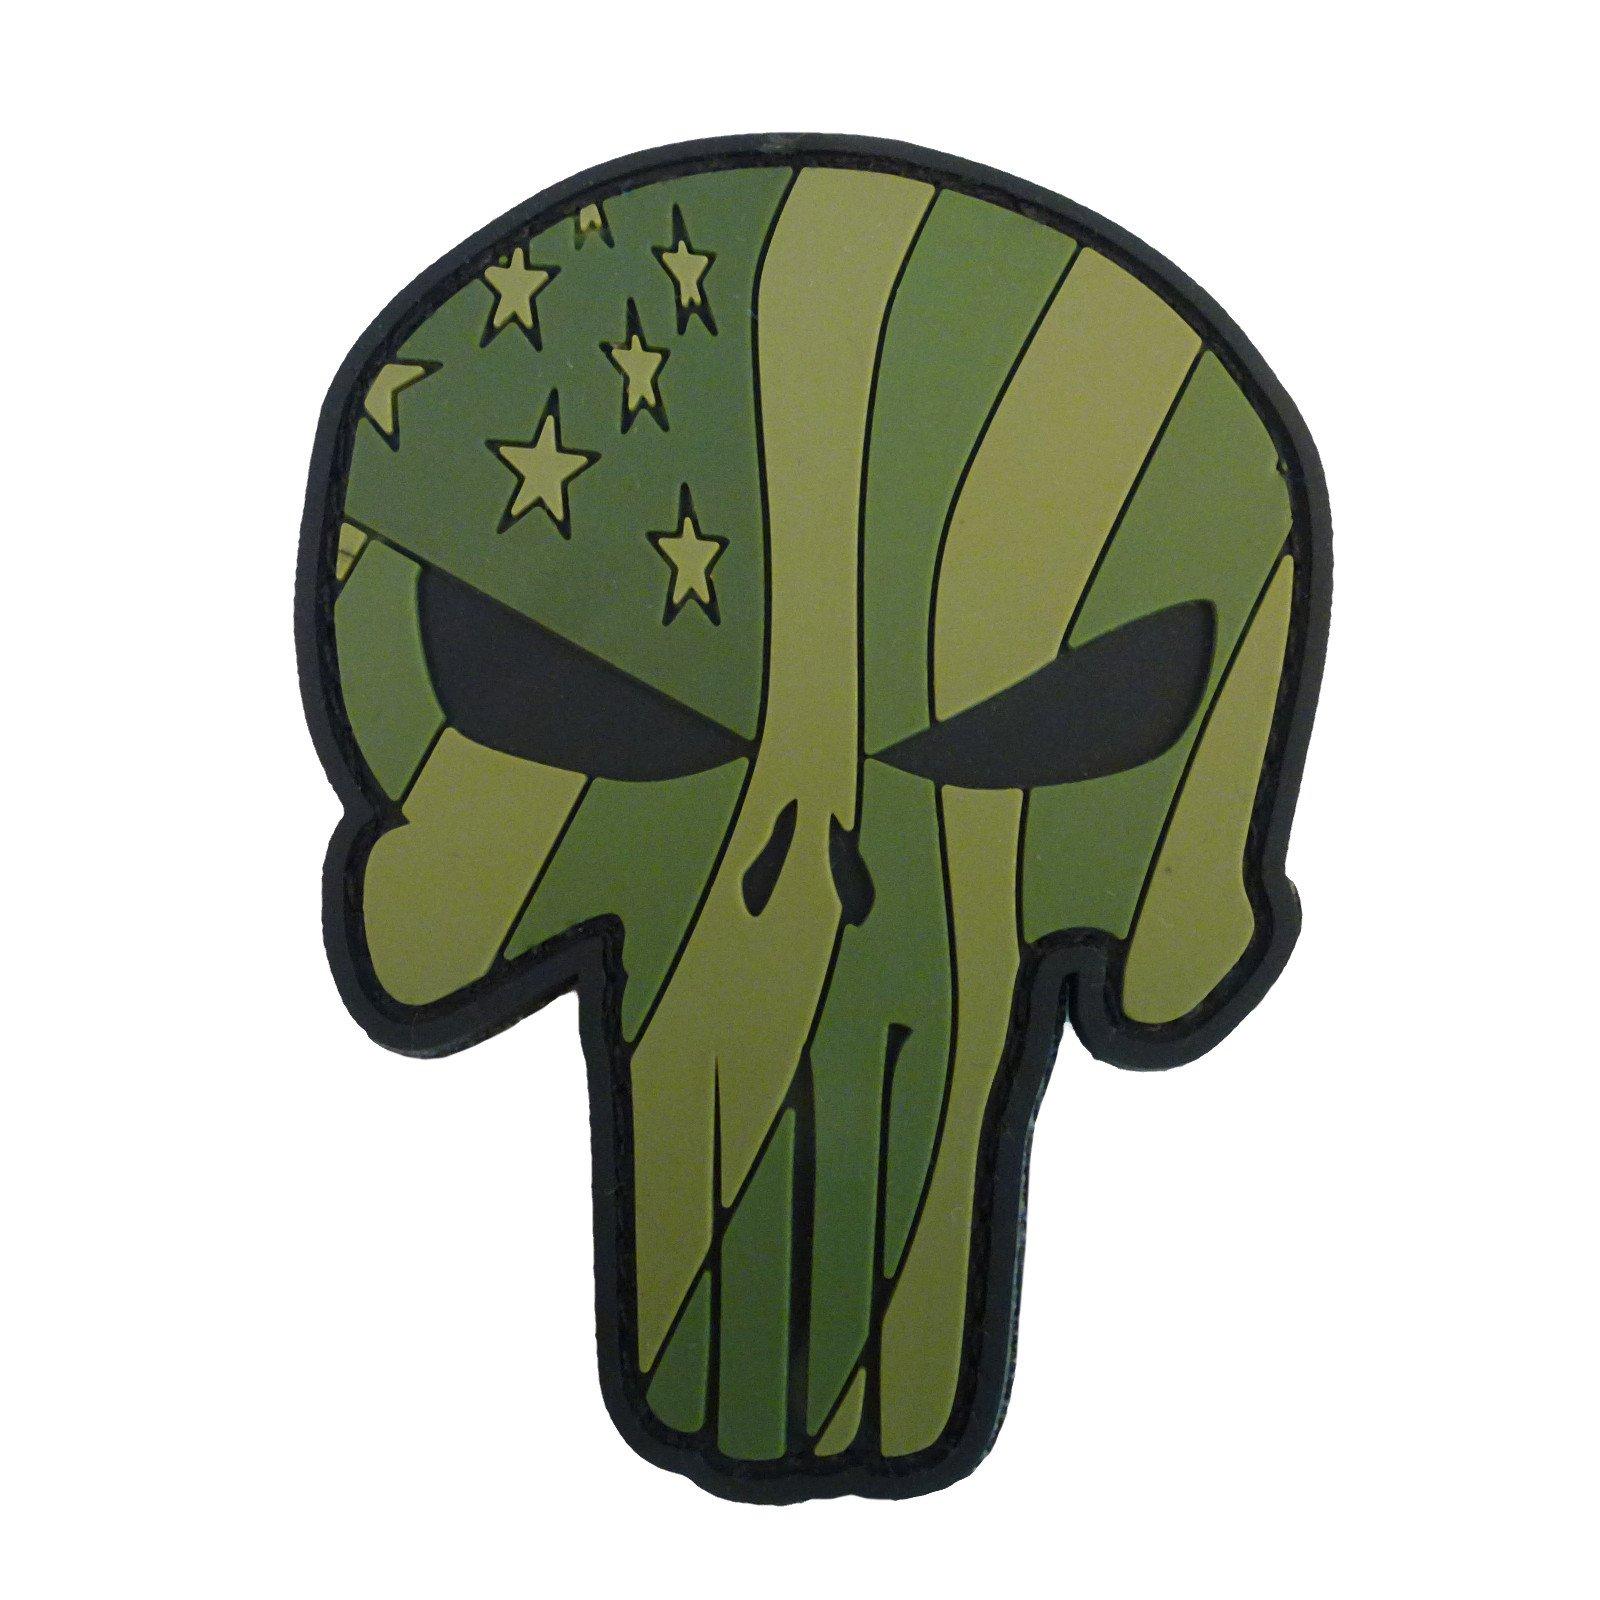 Olive Drab OD 3D Punisher Skull American Waving Flag PVC Rubber Hook&Loop Patch